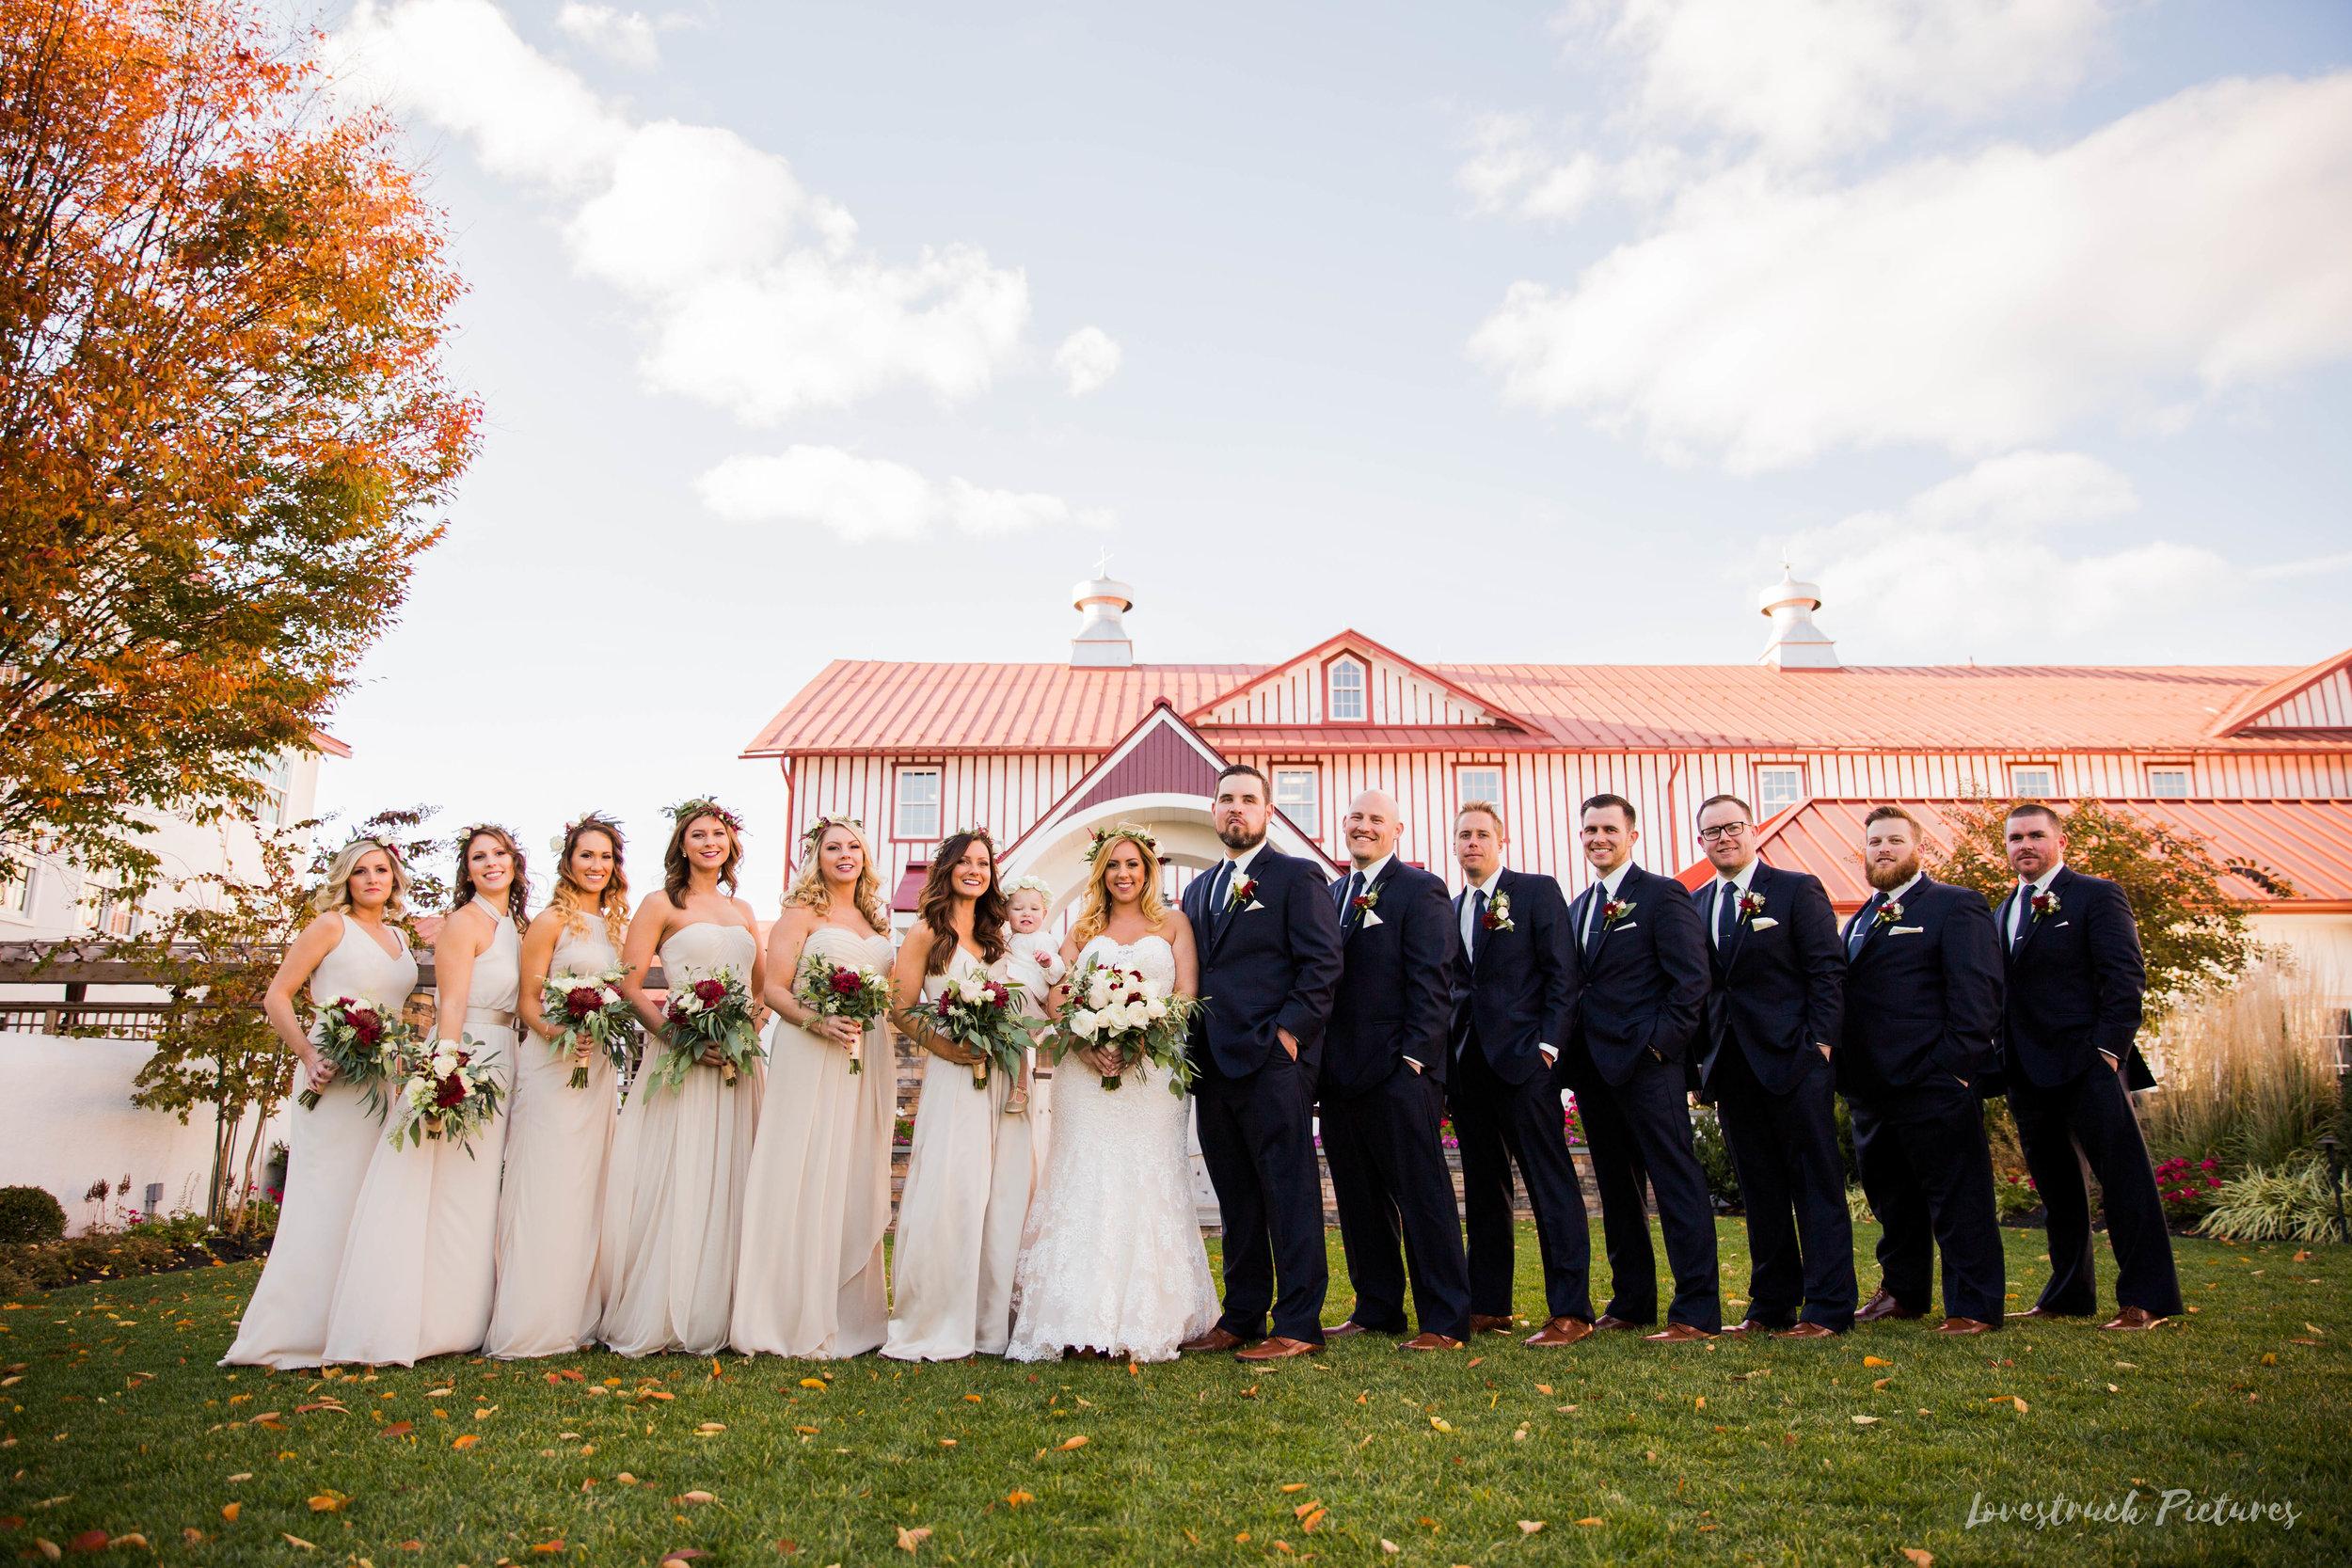 NORMANDY_FARMS_WEDDING_BLUEBELL_PA--31.jpg